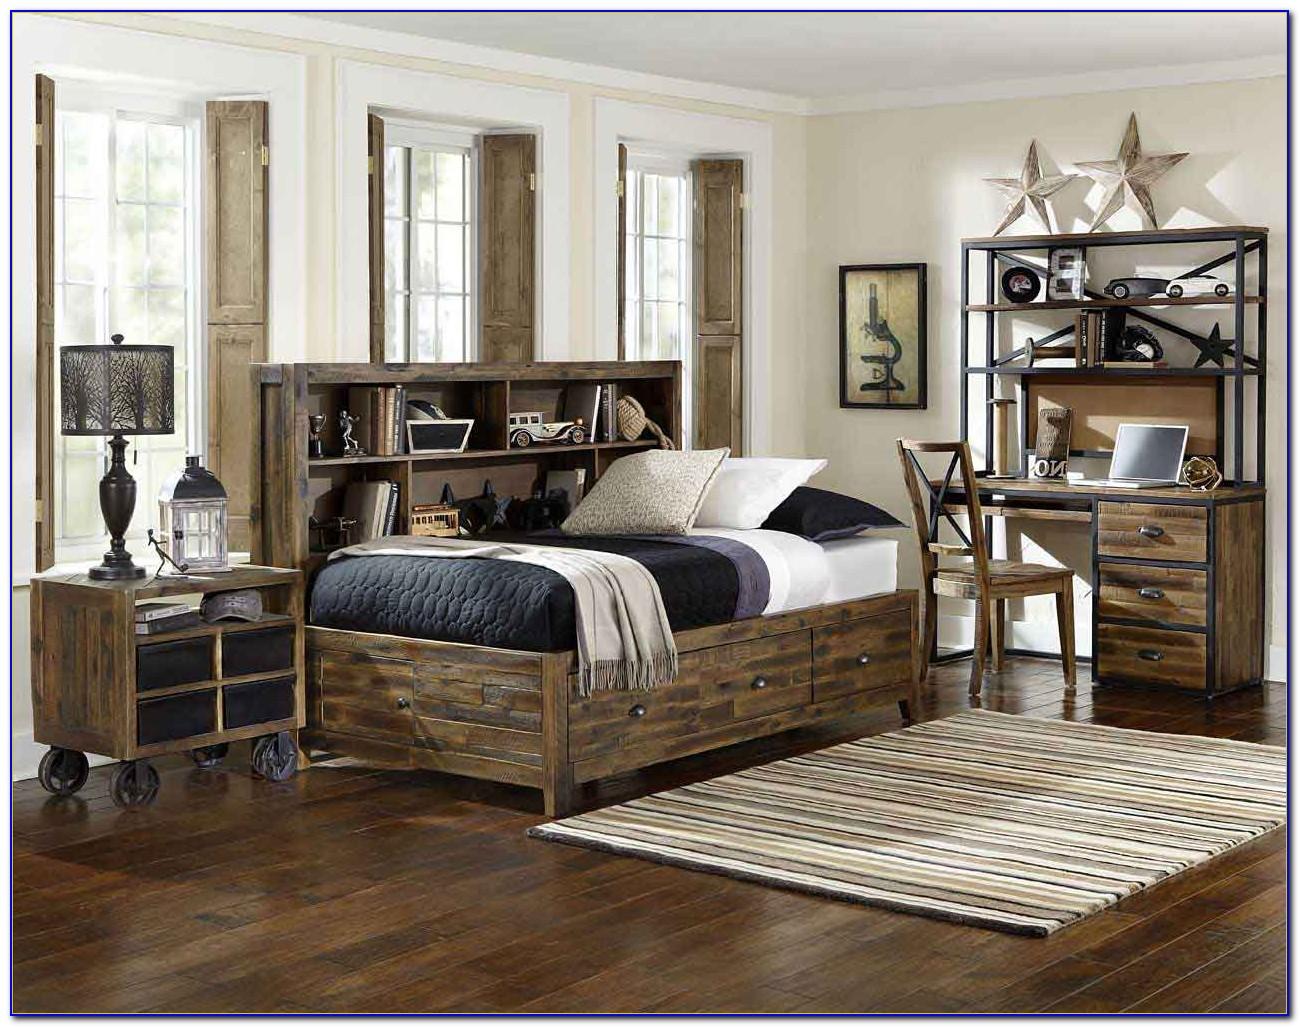 Dark Distressed Wood Bedroom Furniture